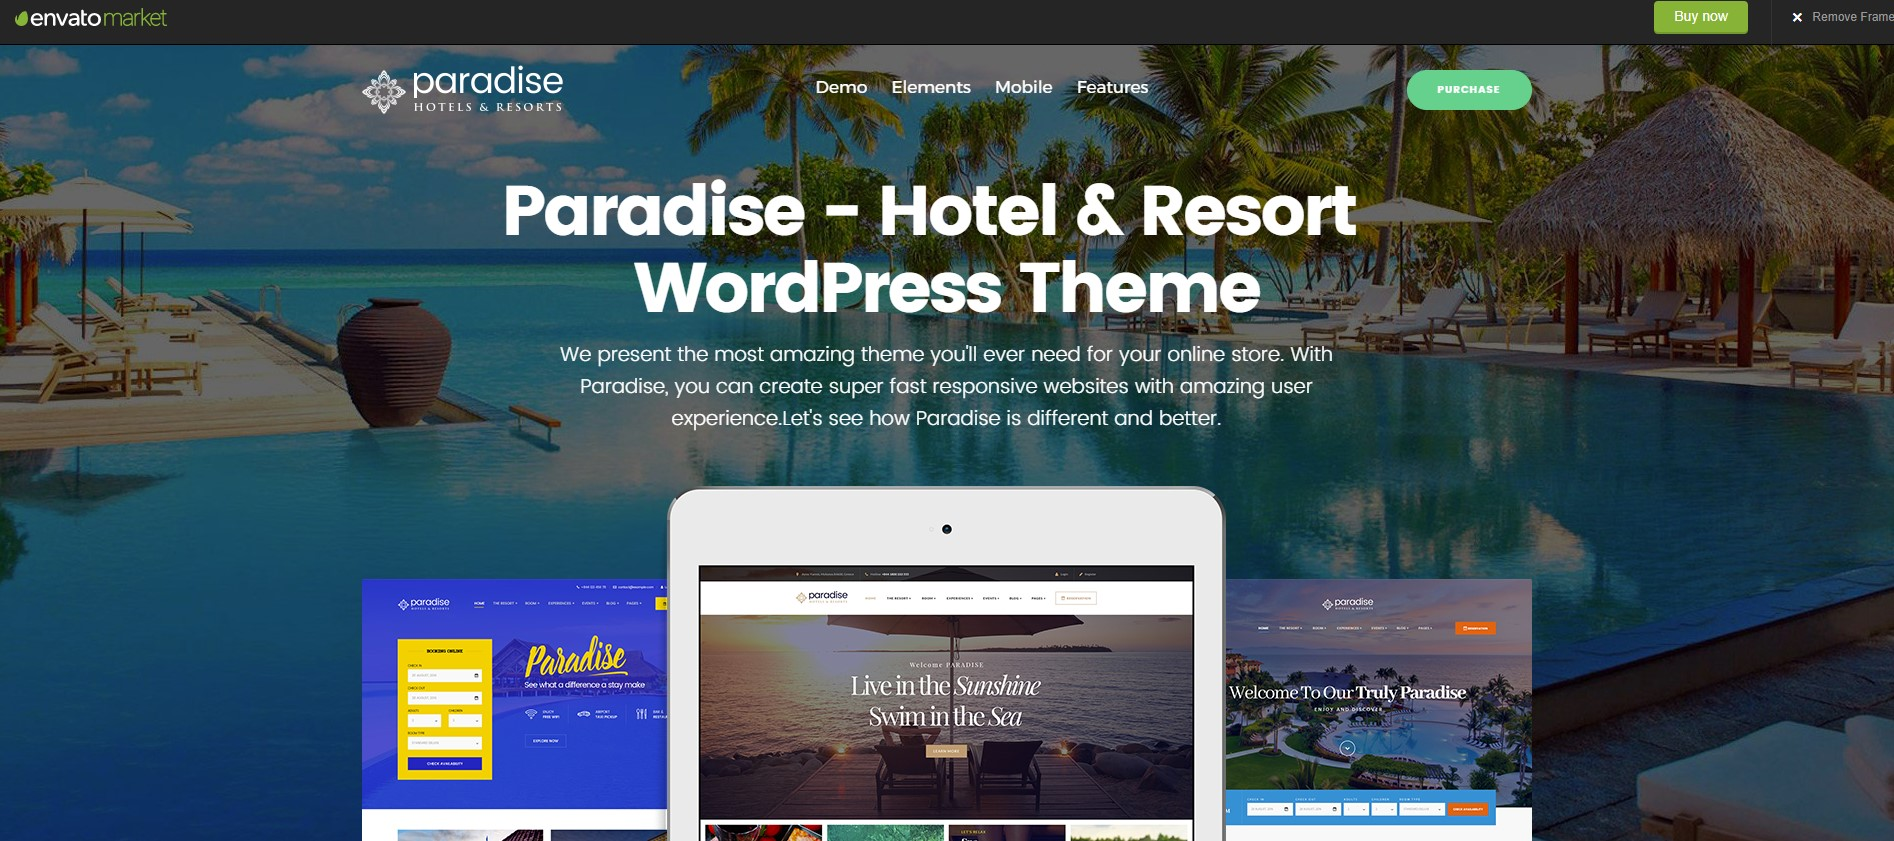 Paradise Hotel & Resort WordPress Theme